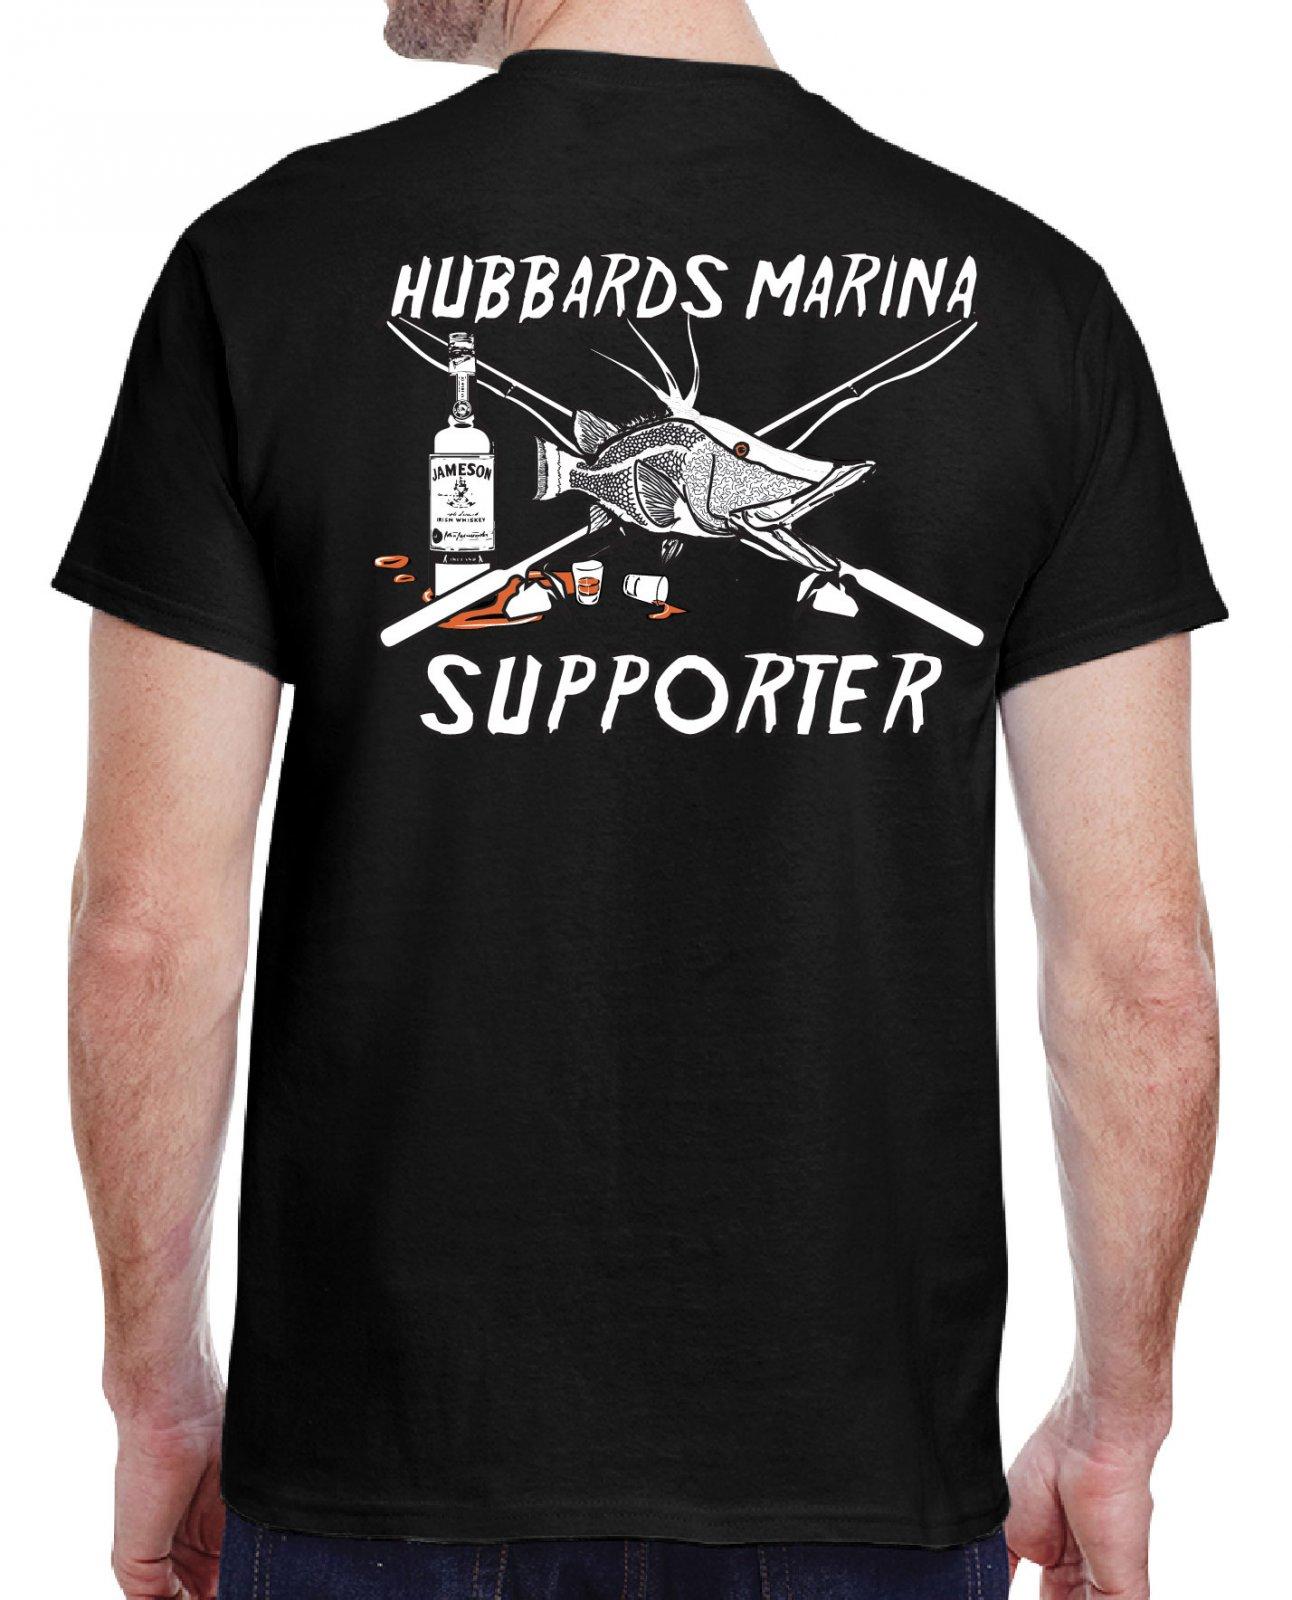 Hubbard's Marina Supporter's T-Shirt